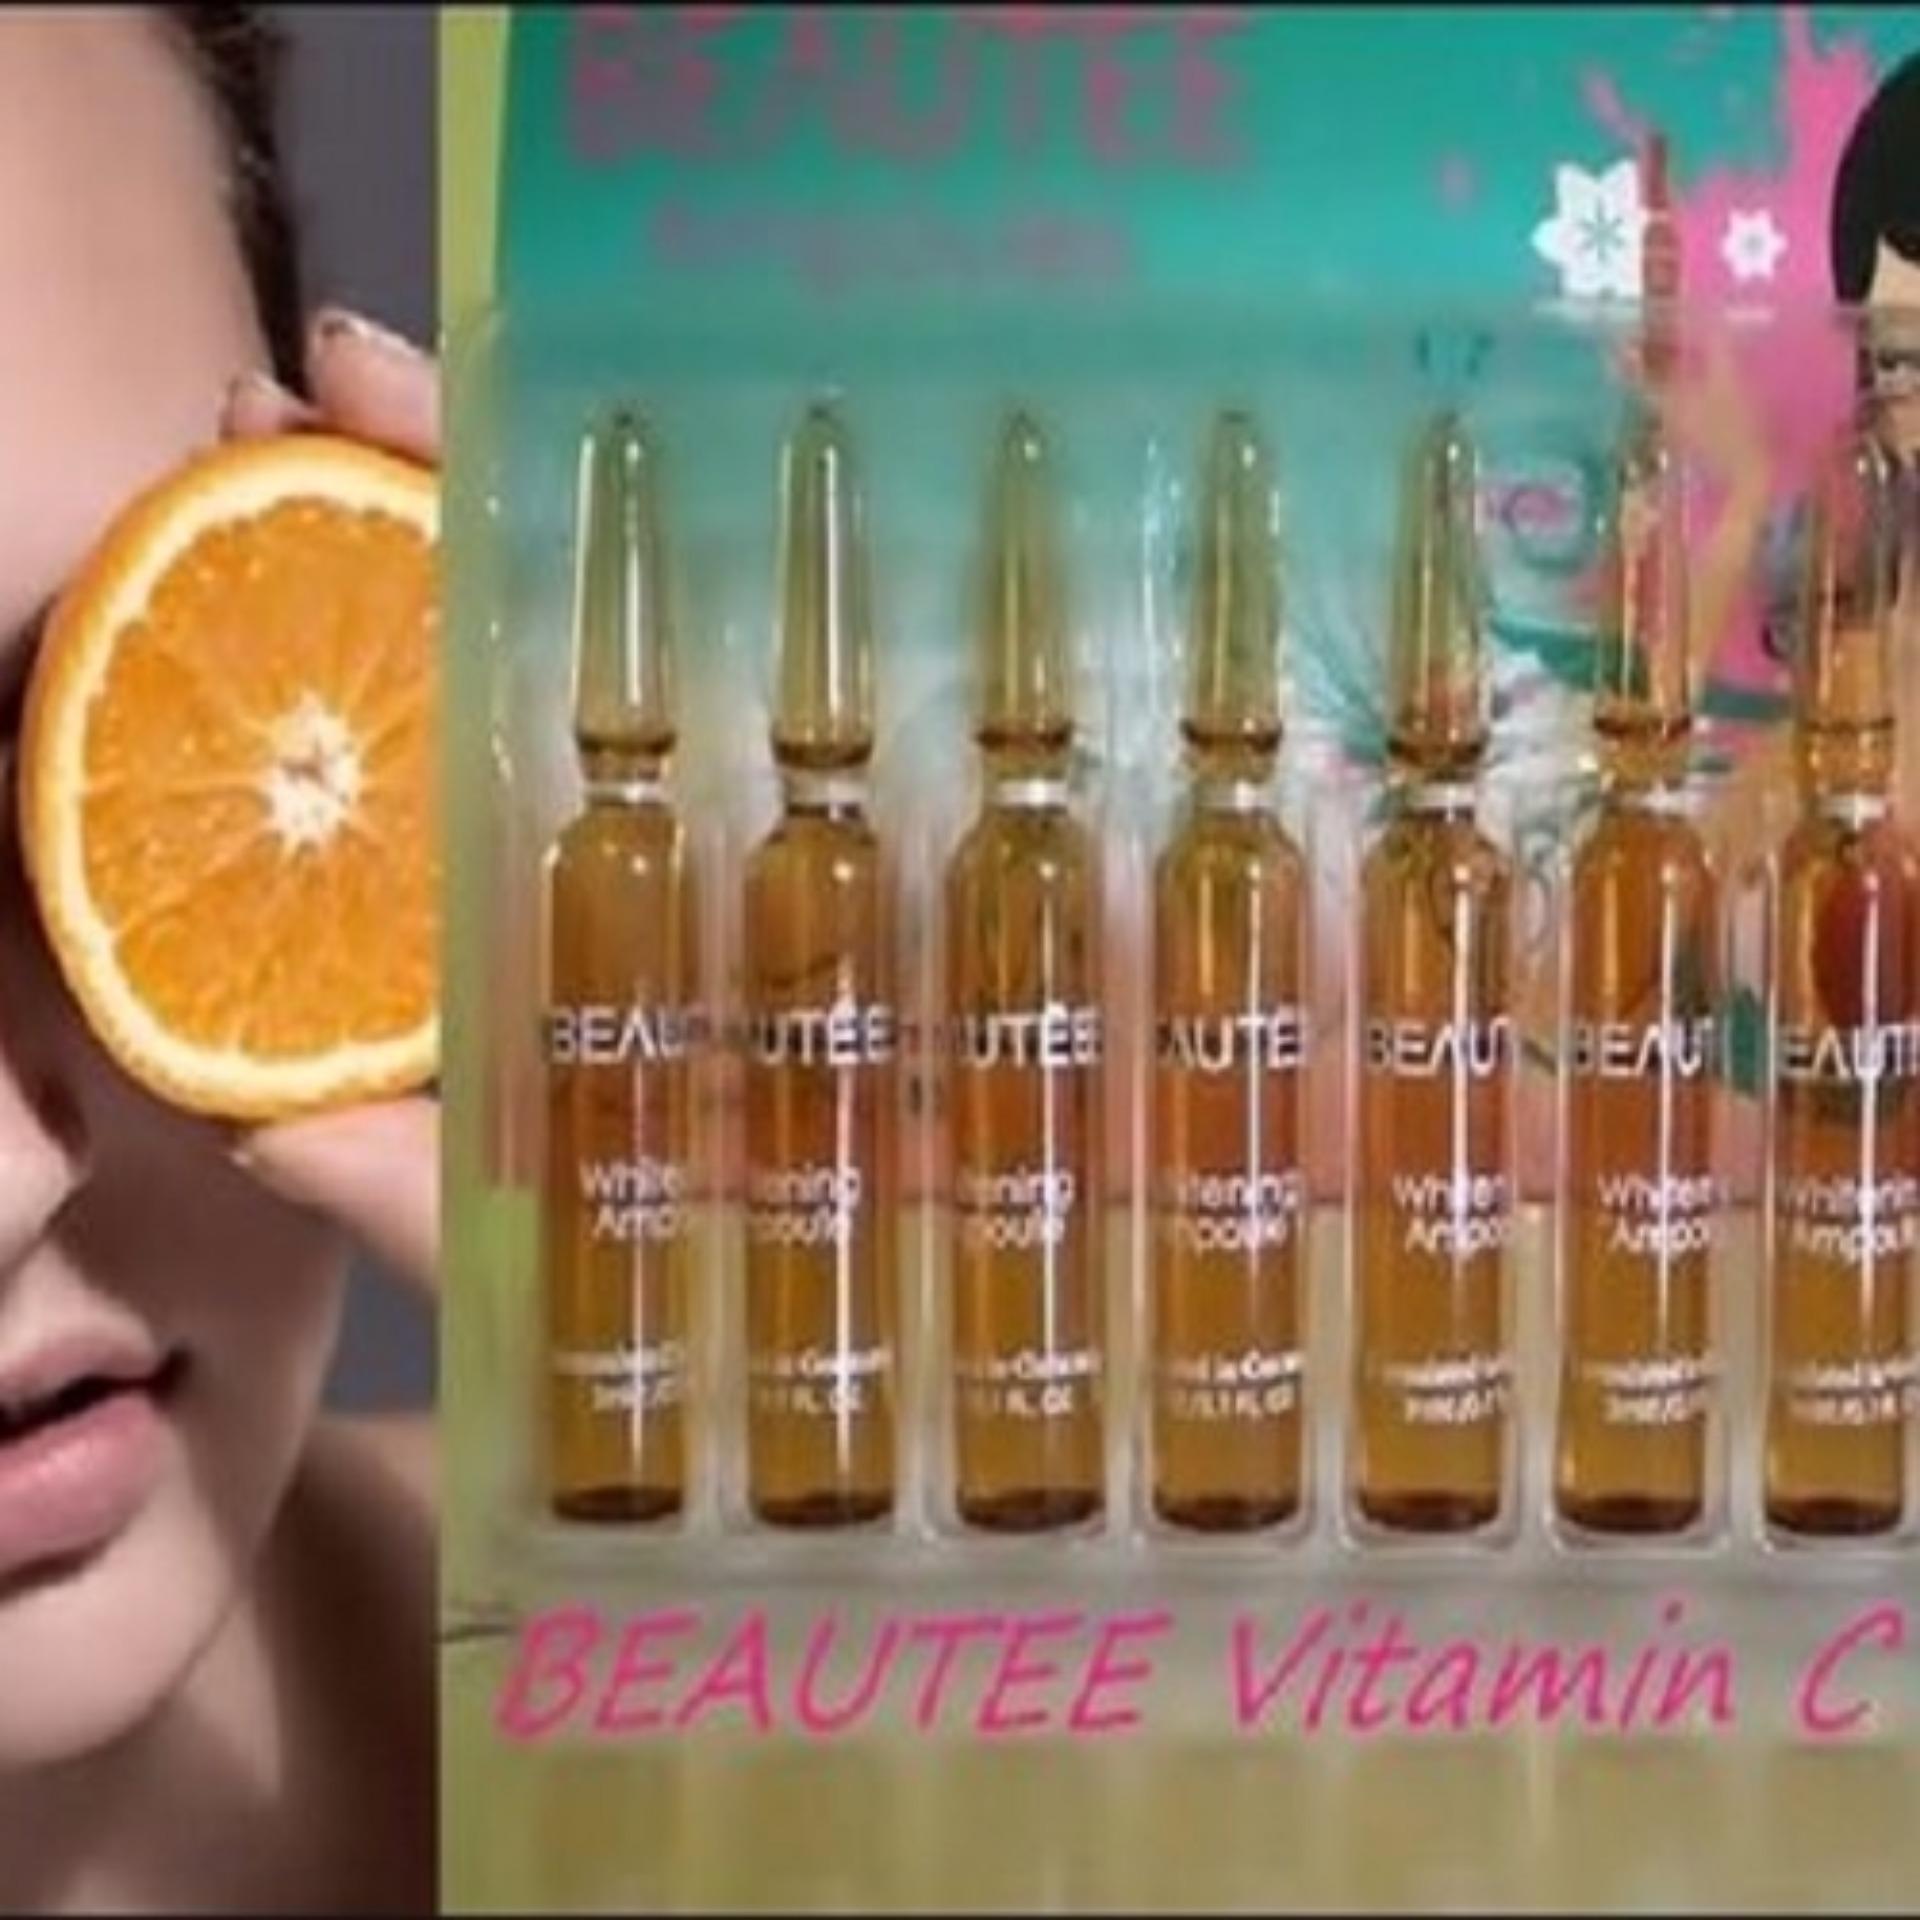 Shampoo Caviar Kuda Dengan Kode Tracking Daftar The Shampo Sudah Bpom 250 Ml Collagen Lip Mask Masker Source Beautee